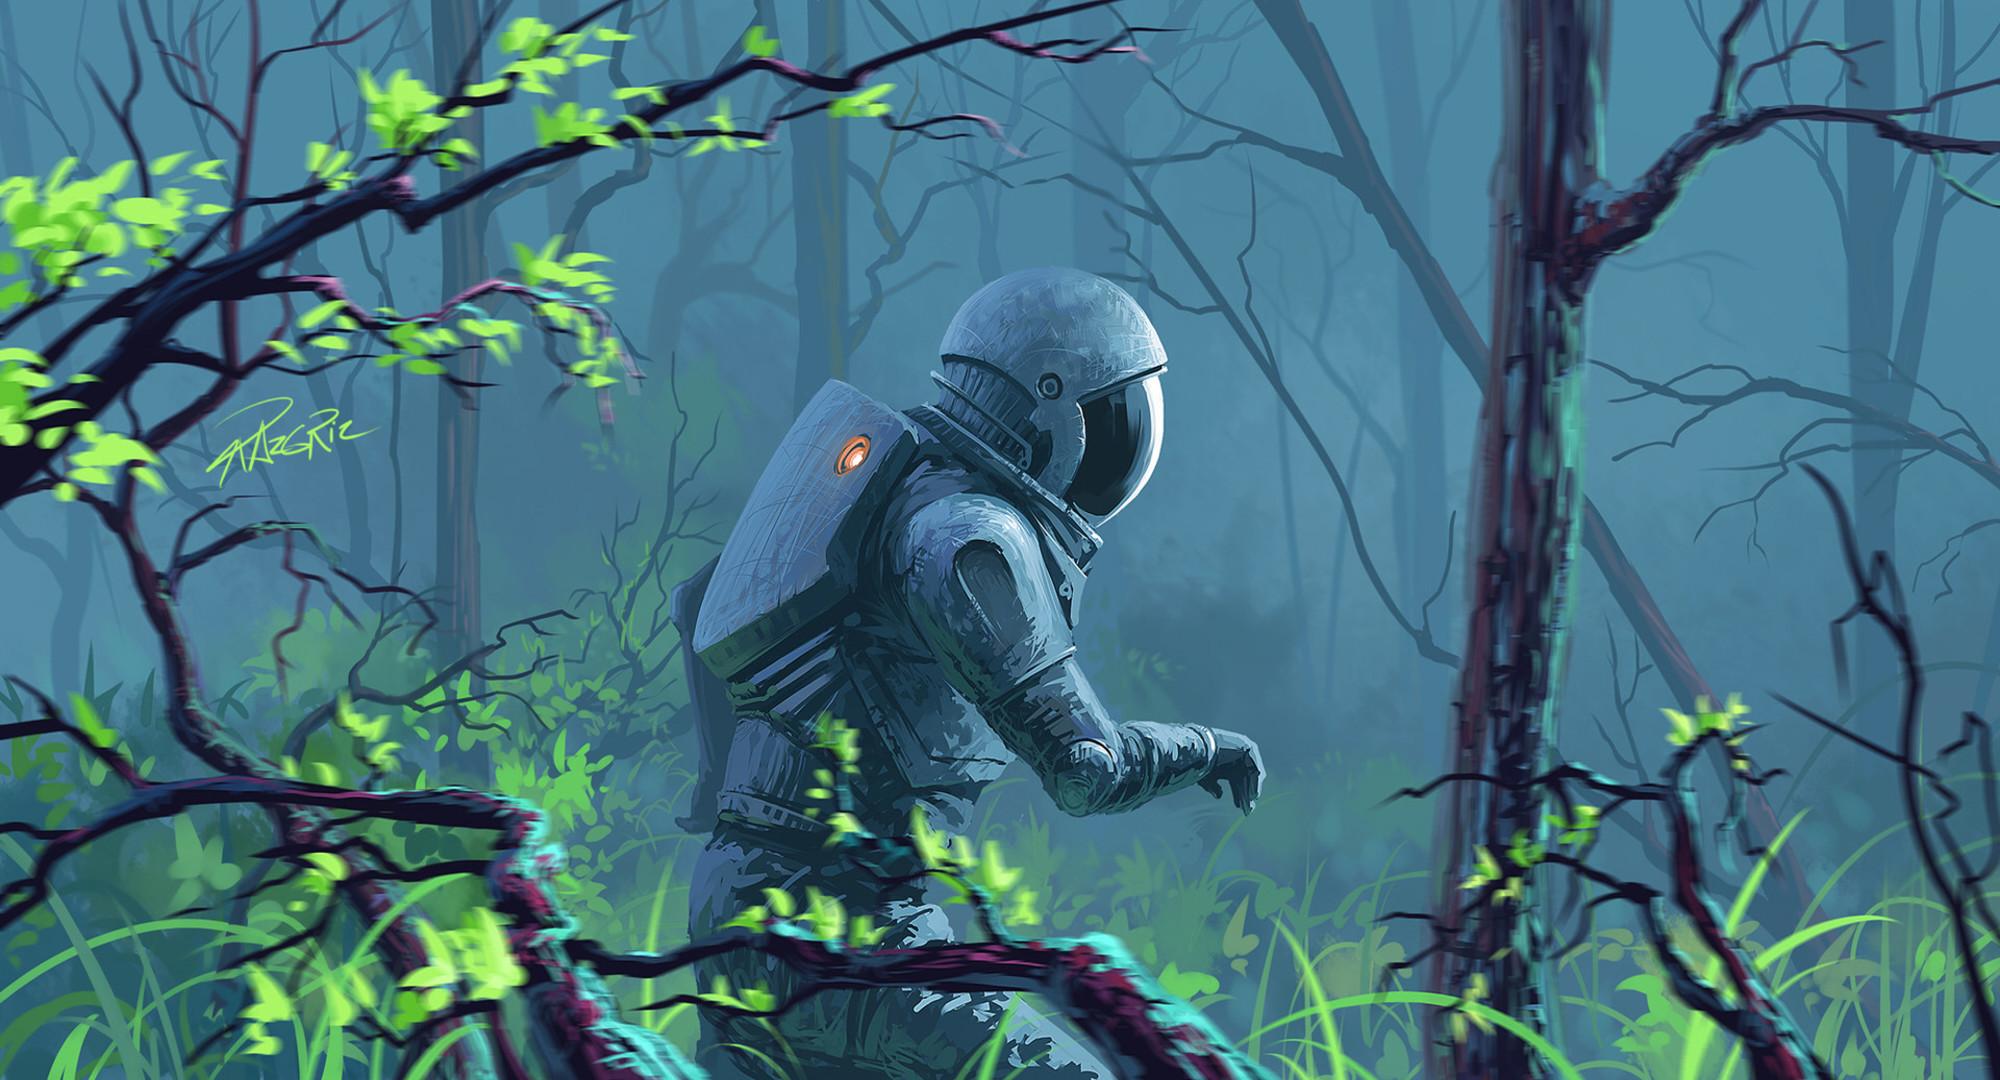 Astronaut 2000x1080